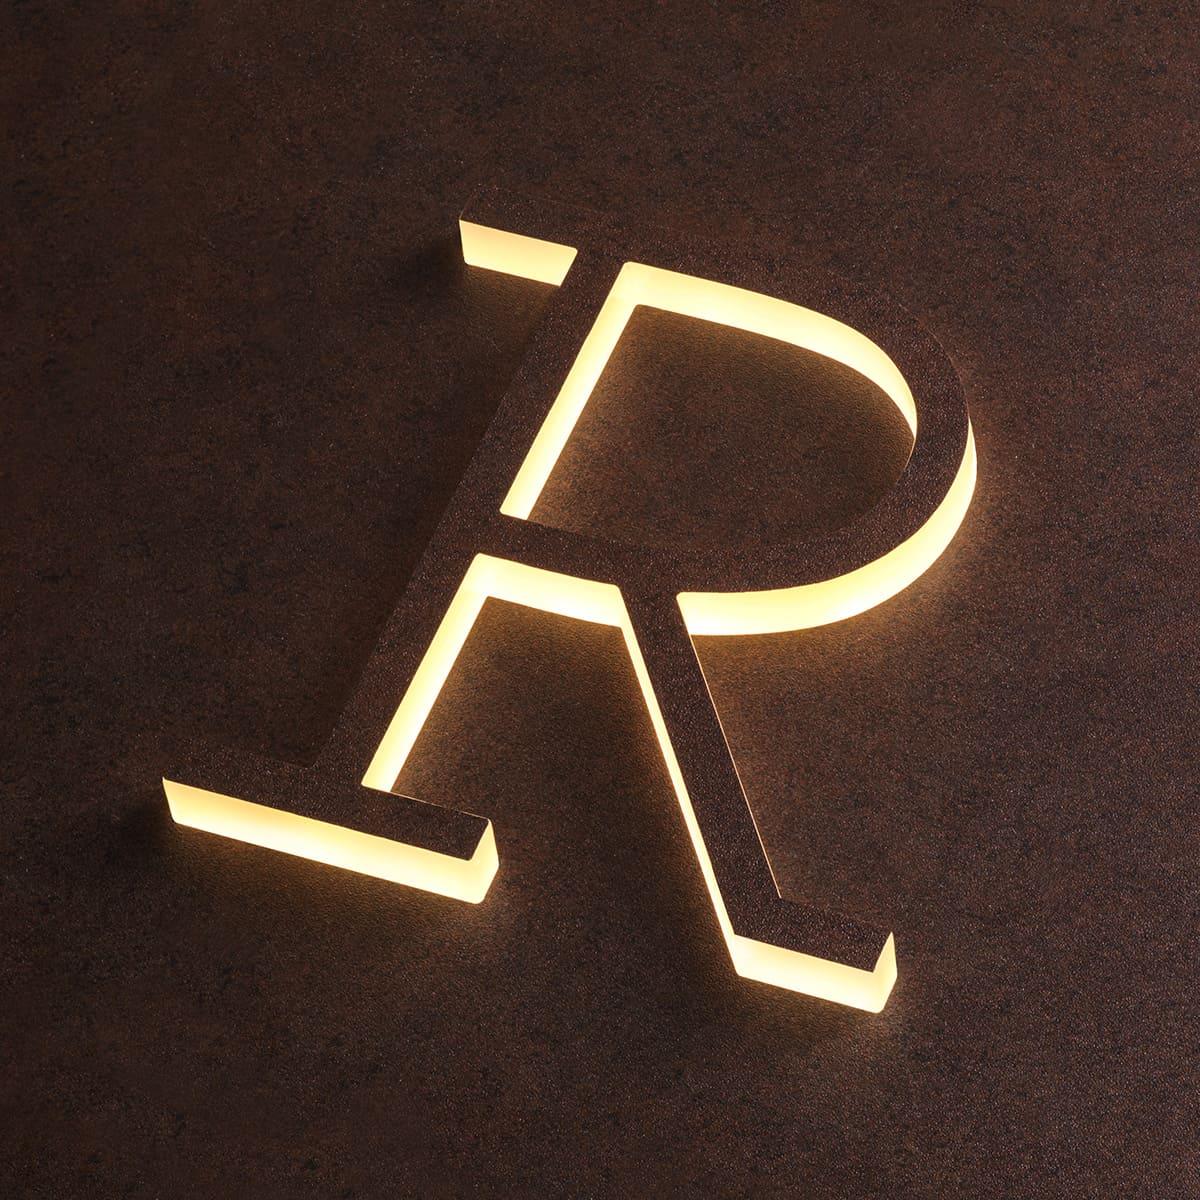 LEDサイン、LED看板のLEDIUS SIGN BOARD SIDE